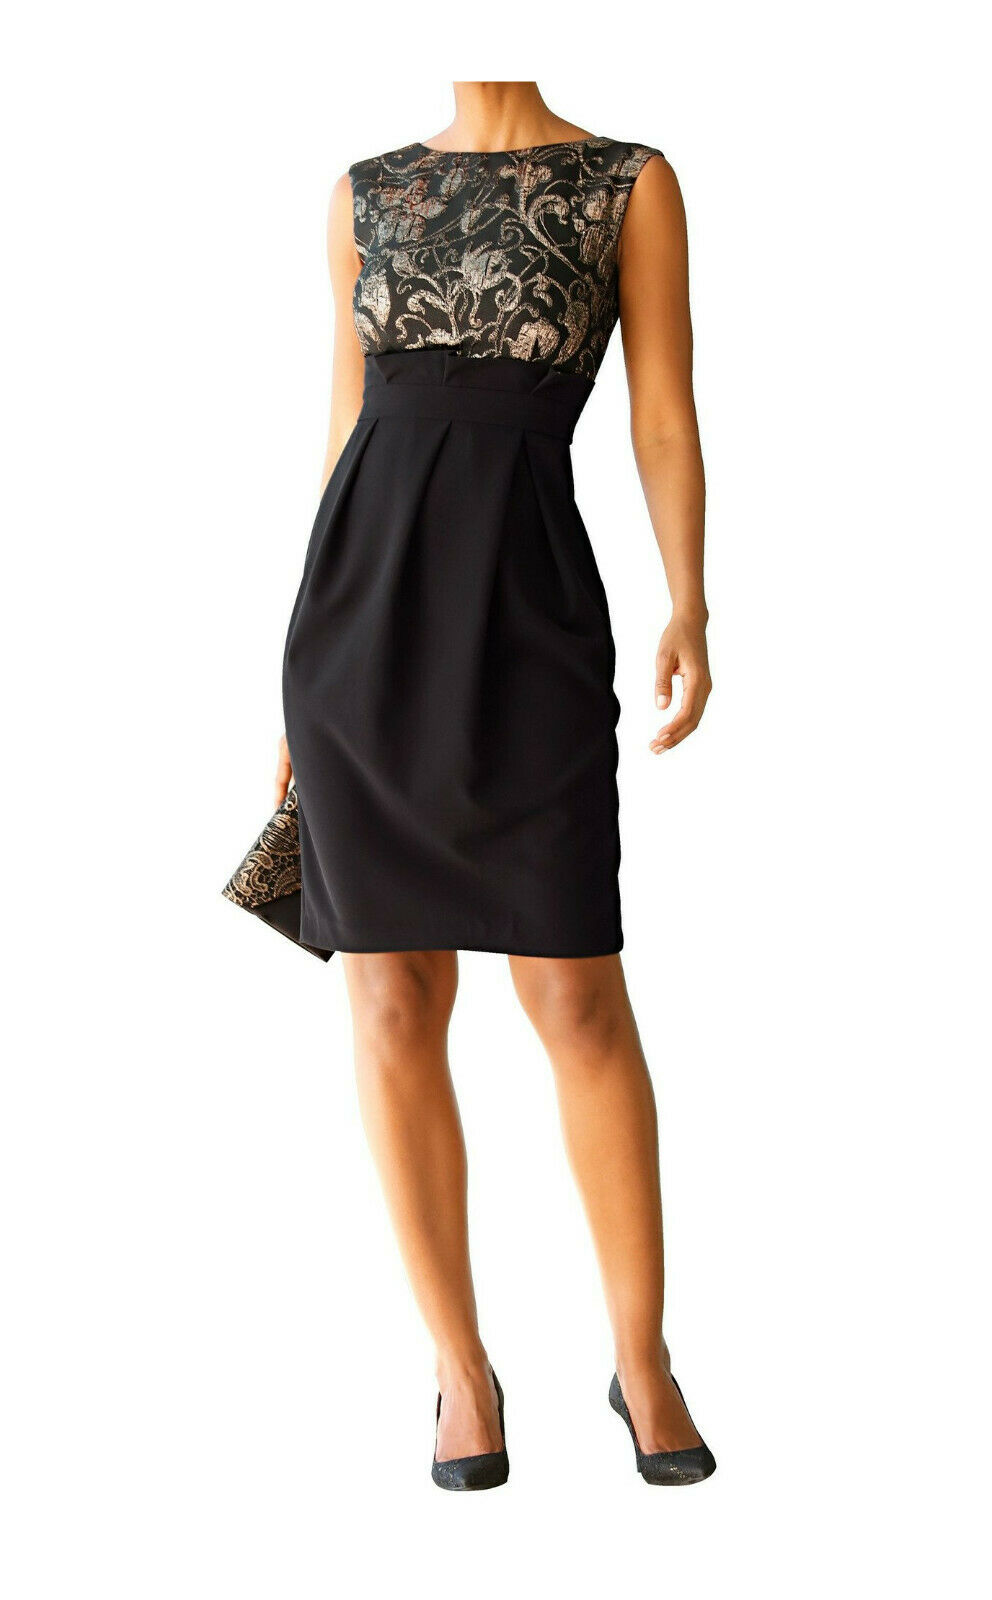 super quality big sale official supplier Details zu Amy Vermont Kleid mit Jacquardmuster, schwarz. NEU!!! KP 159,99  € SALE%%%